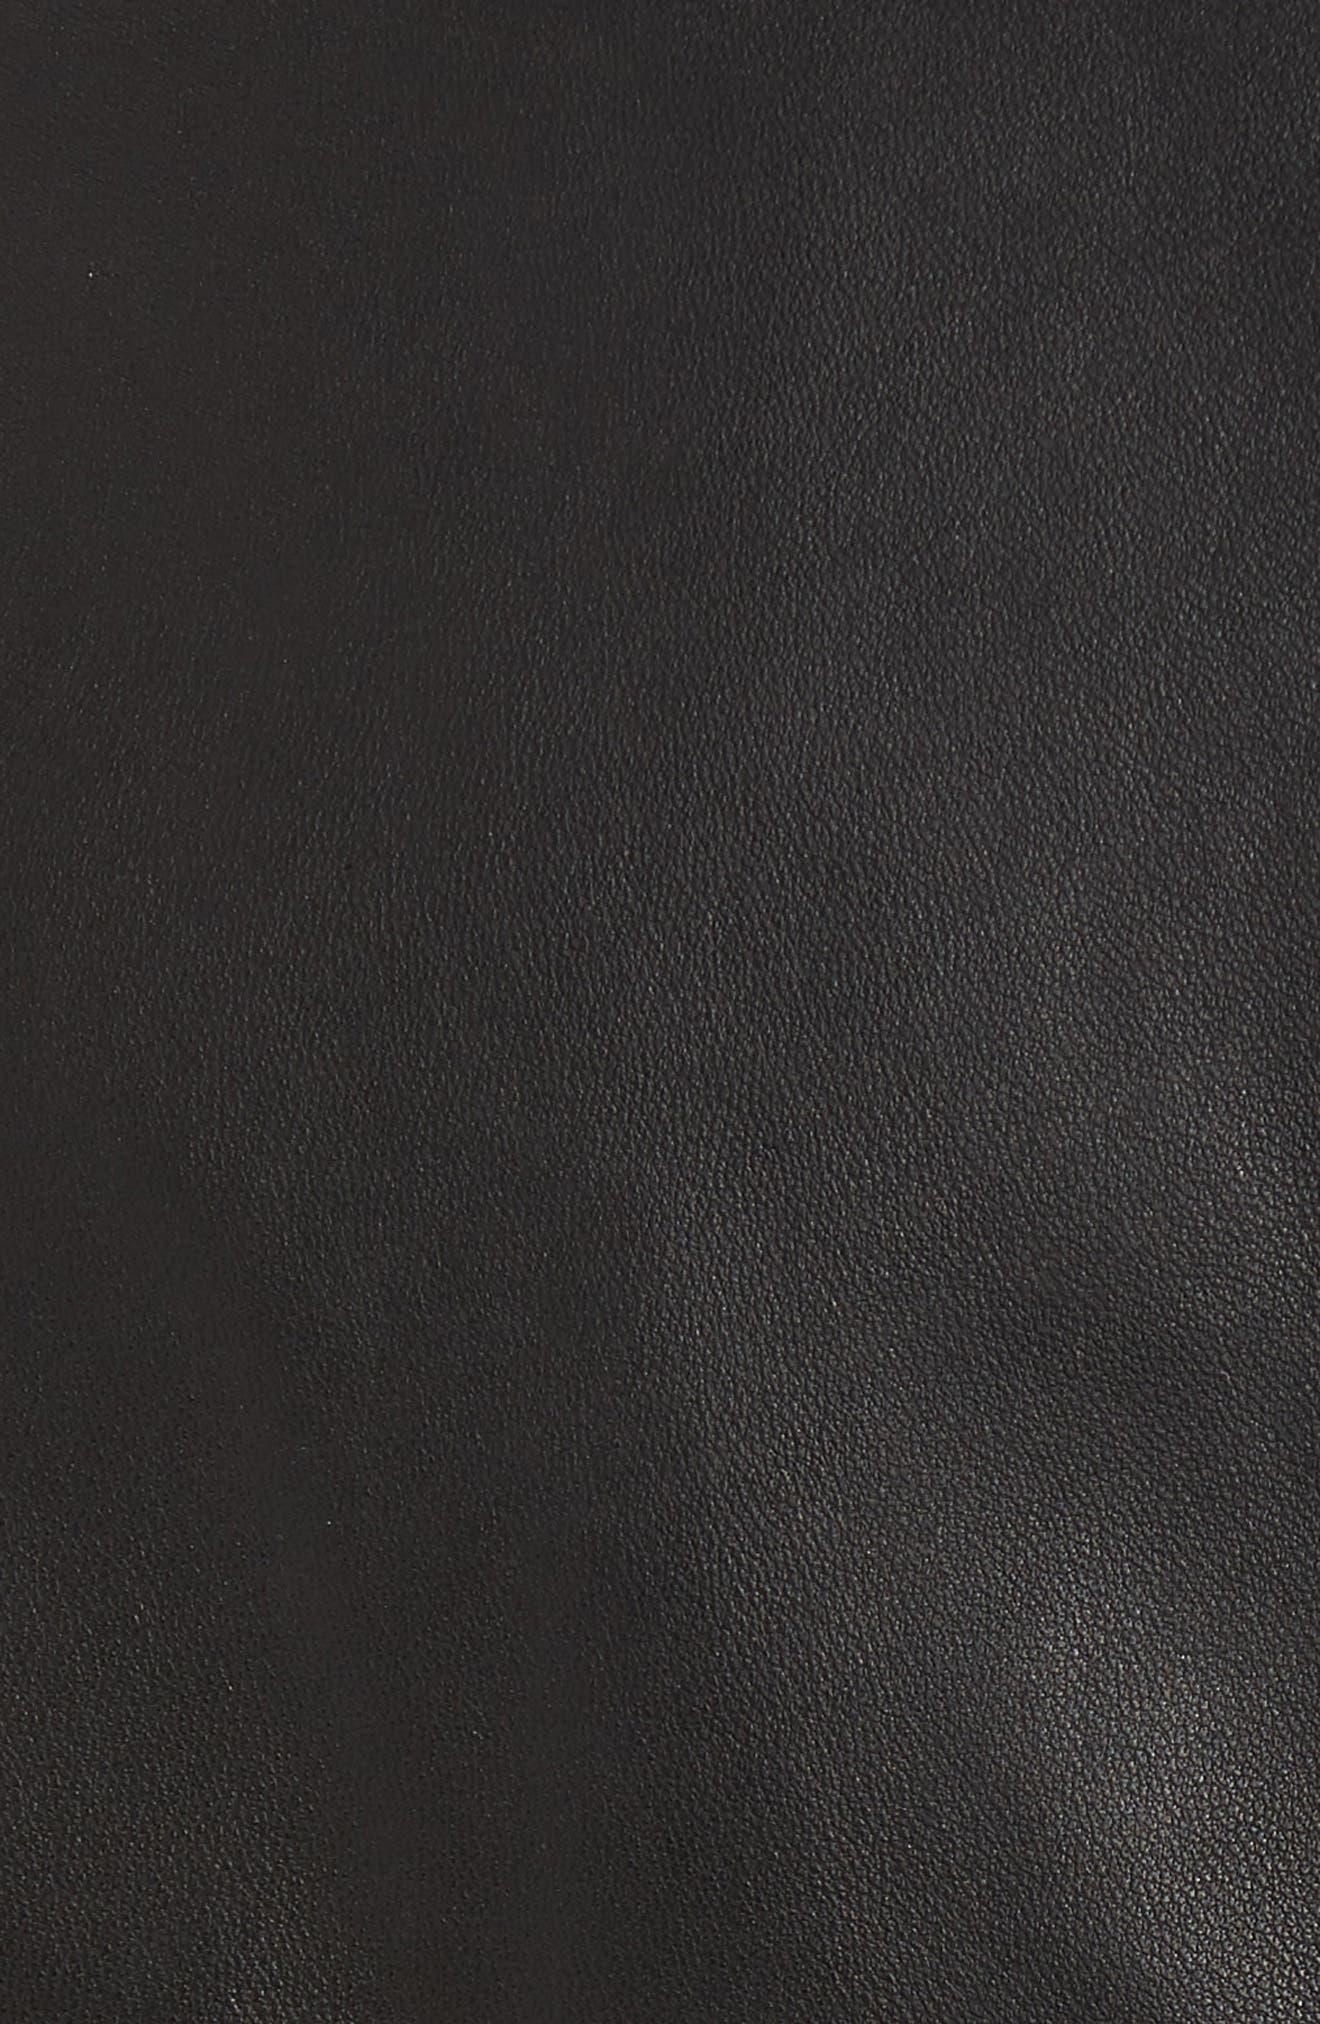 MACKAGE,                             Pina-L Leather Moto Jacket,                             Alternate thumbnail 6, color,                             001